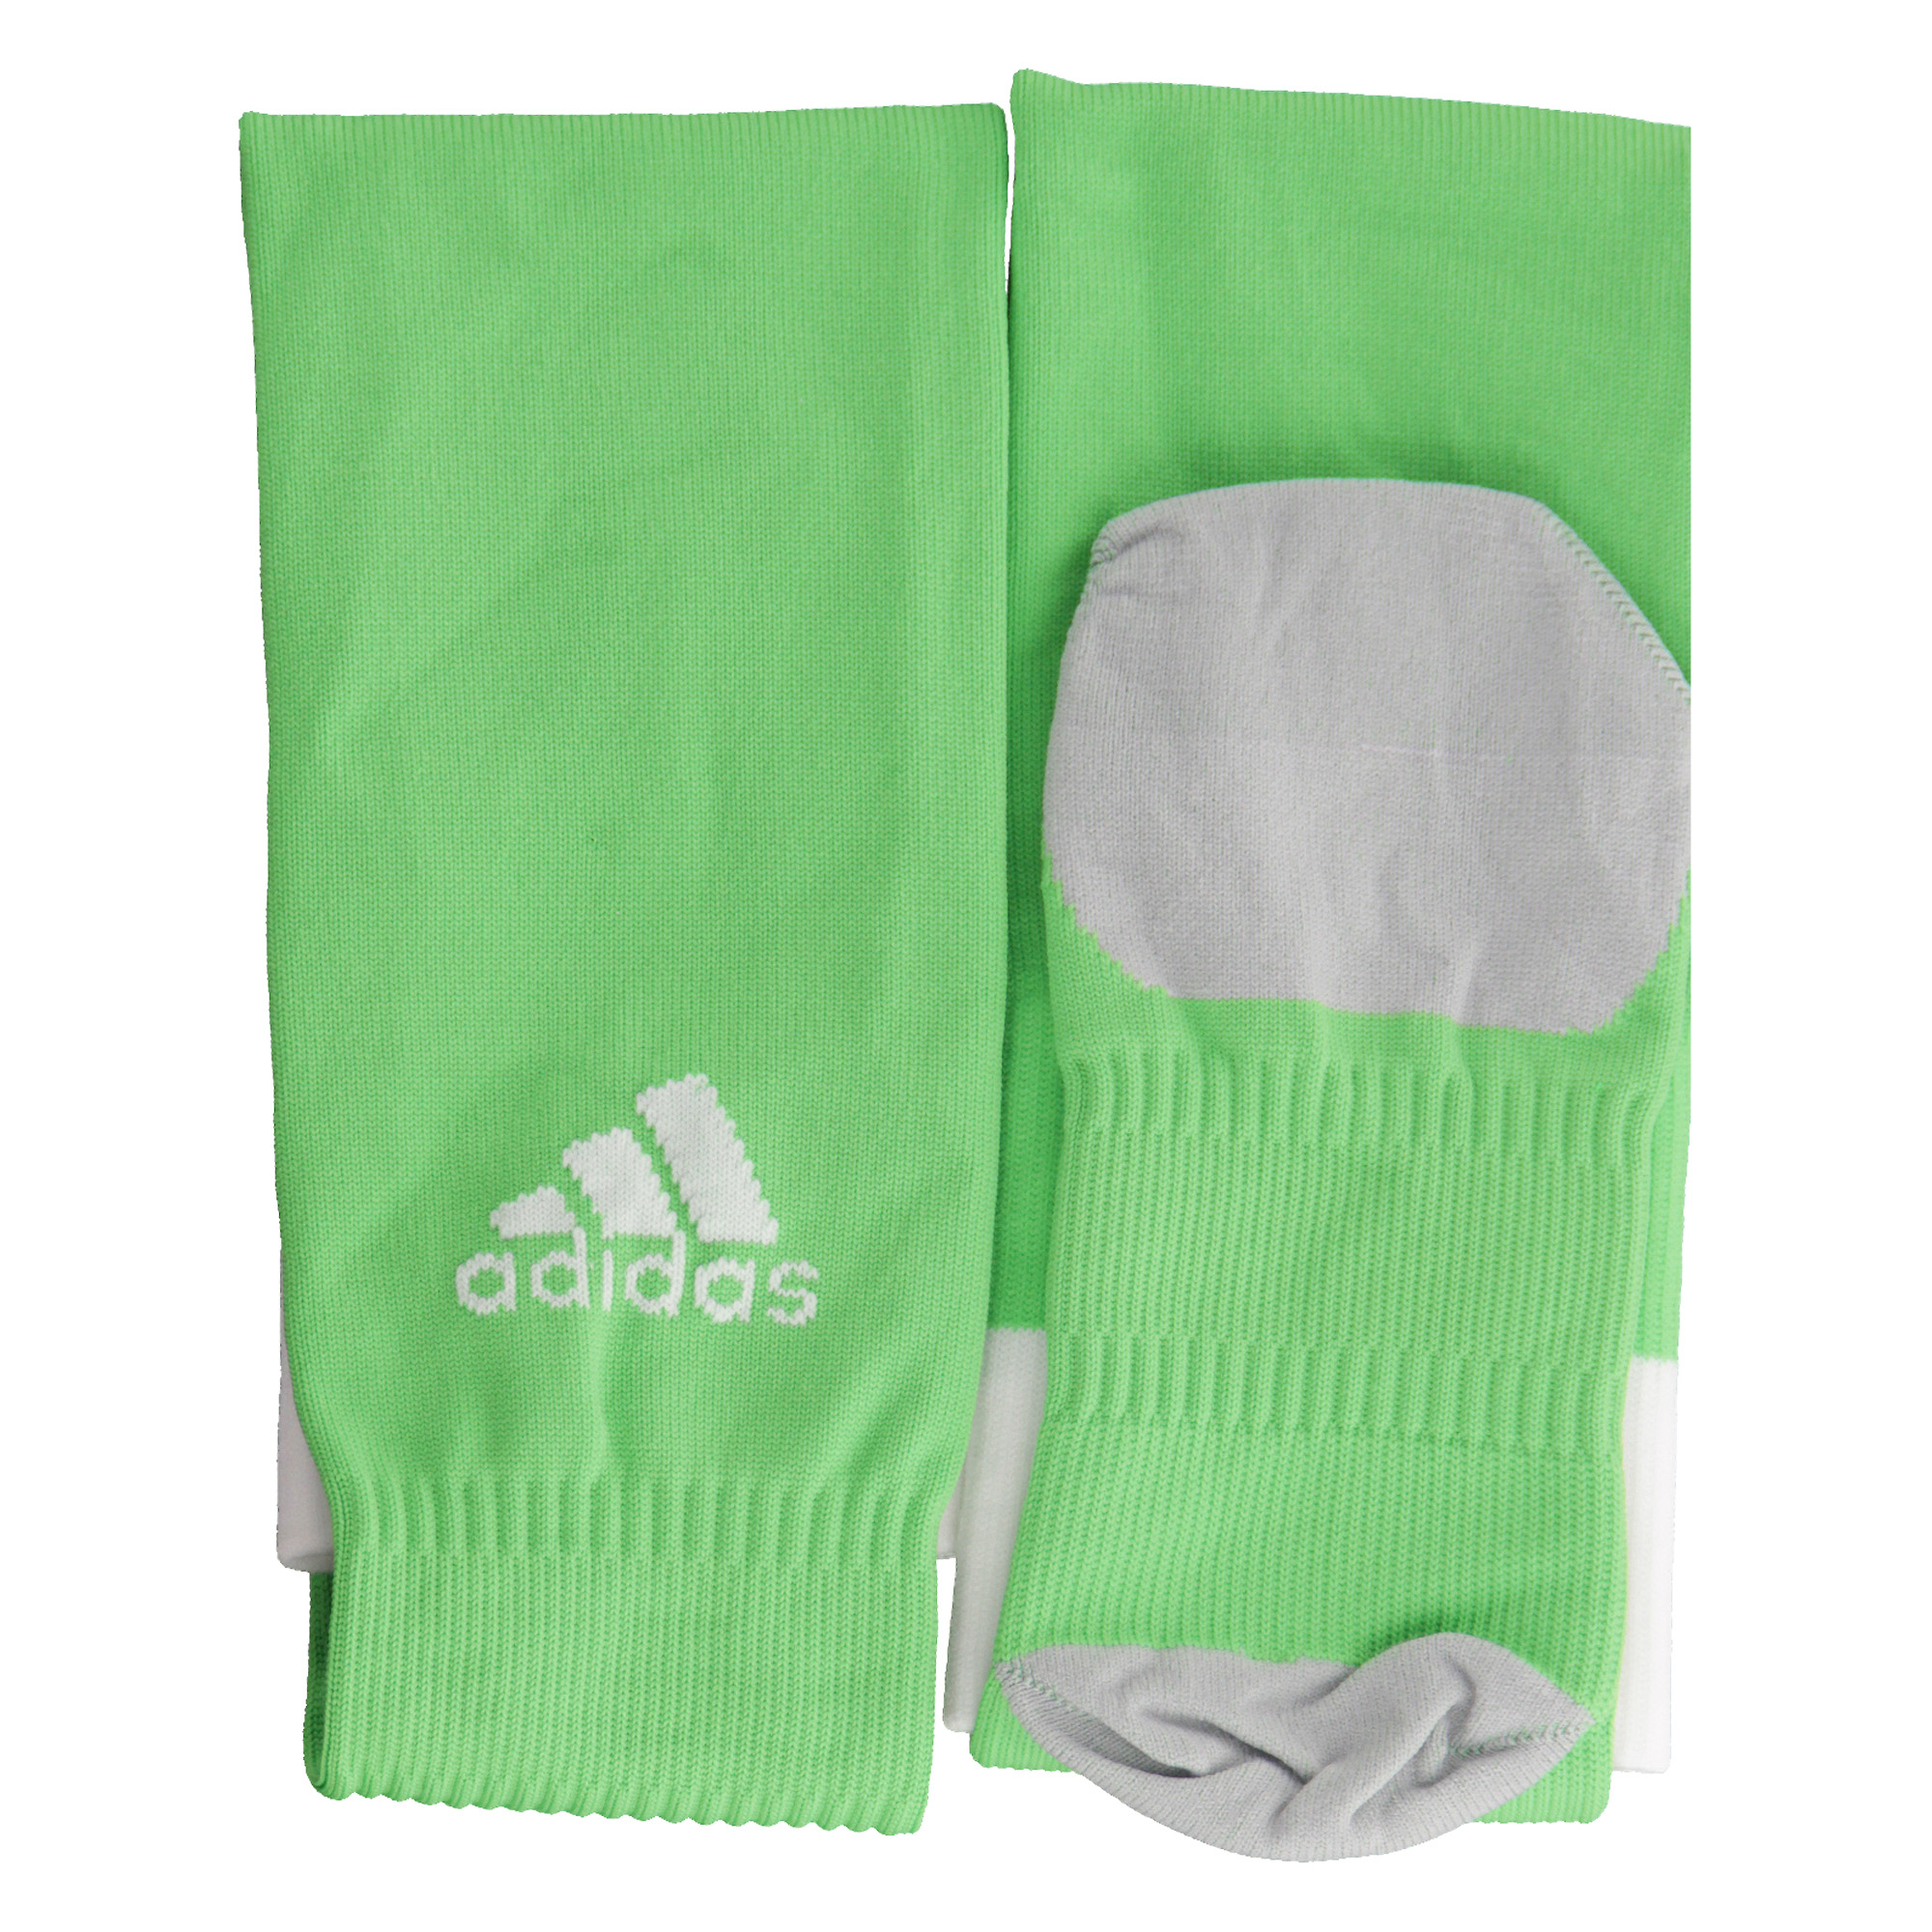 adidas Fussballsocken Pro Sock AZ3756 37-39 bei Cortexpower - Sportshop